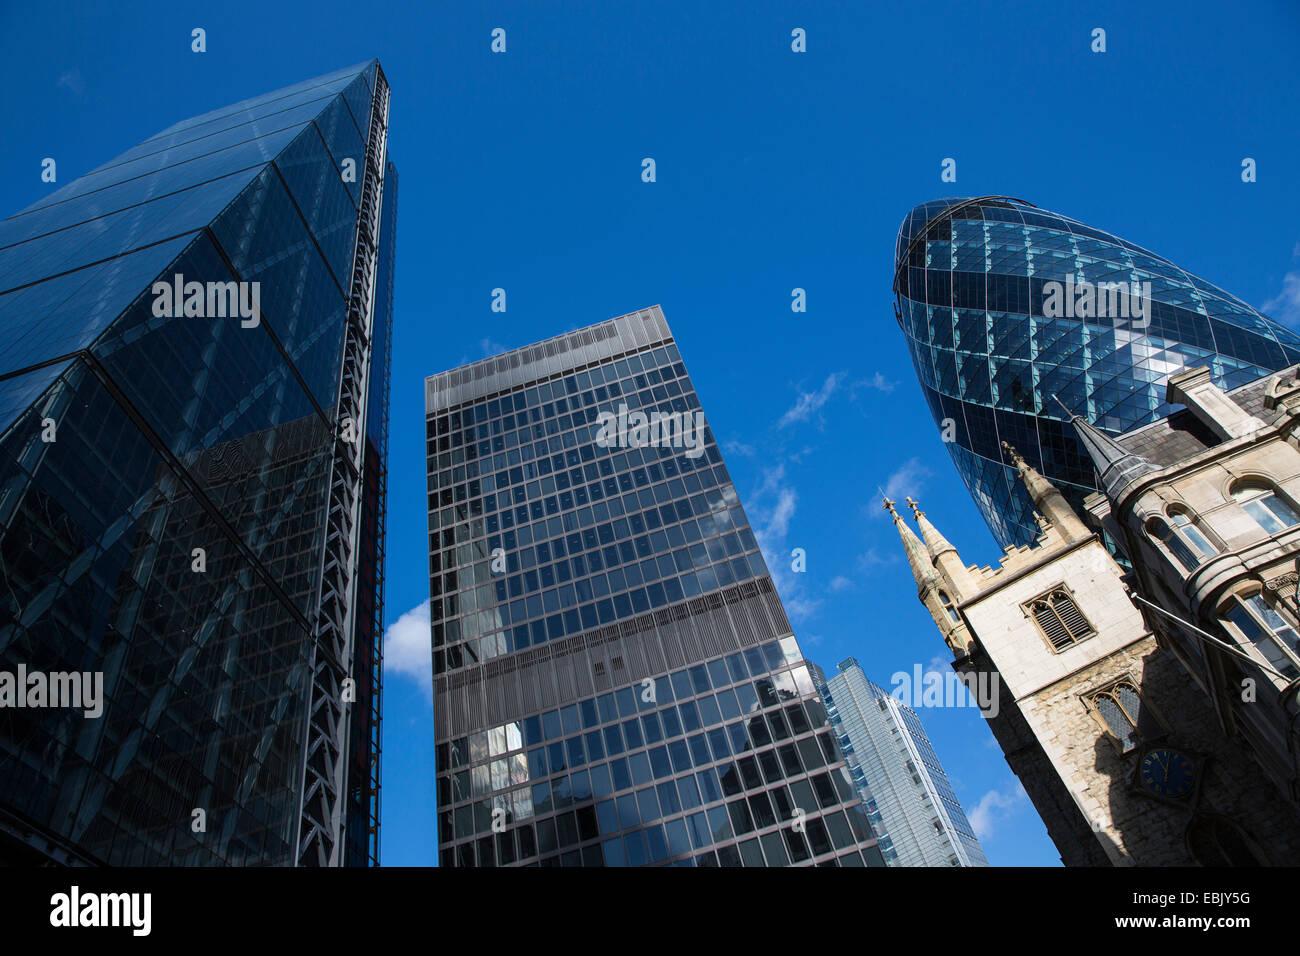 Canary Wharf, Gherkin, St Andrew Undershaft, London, England - Stock Image